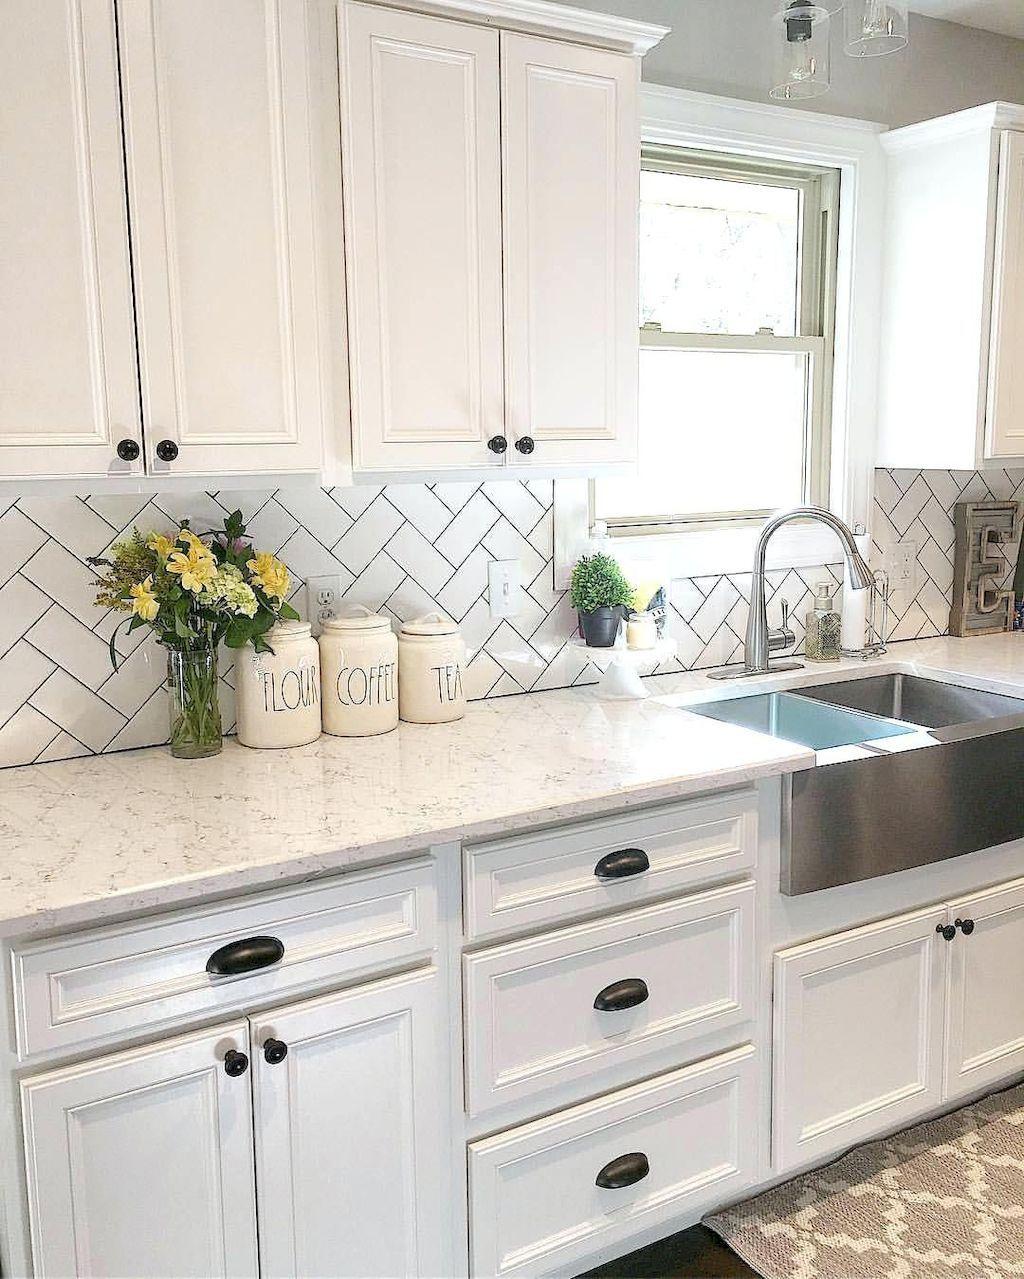 70 Modern Farmhouse Kitchen Cabinet Makeover Design Ideas Kitchen Cabinets Decor Kitchen Renovation Farmhouse Kitchen Cabinets